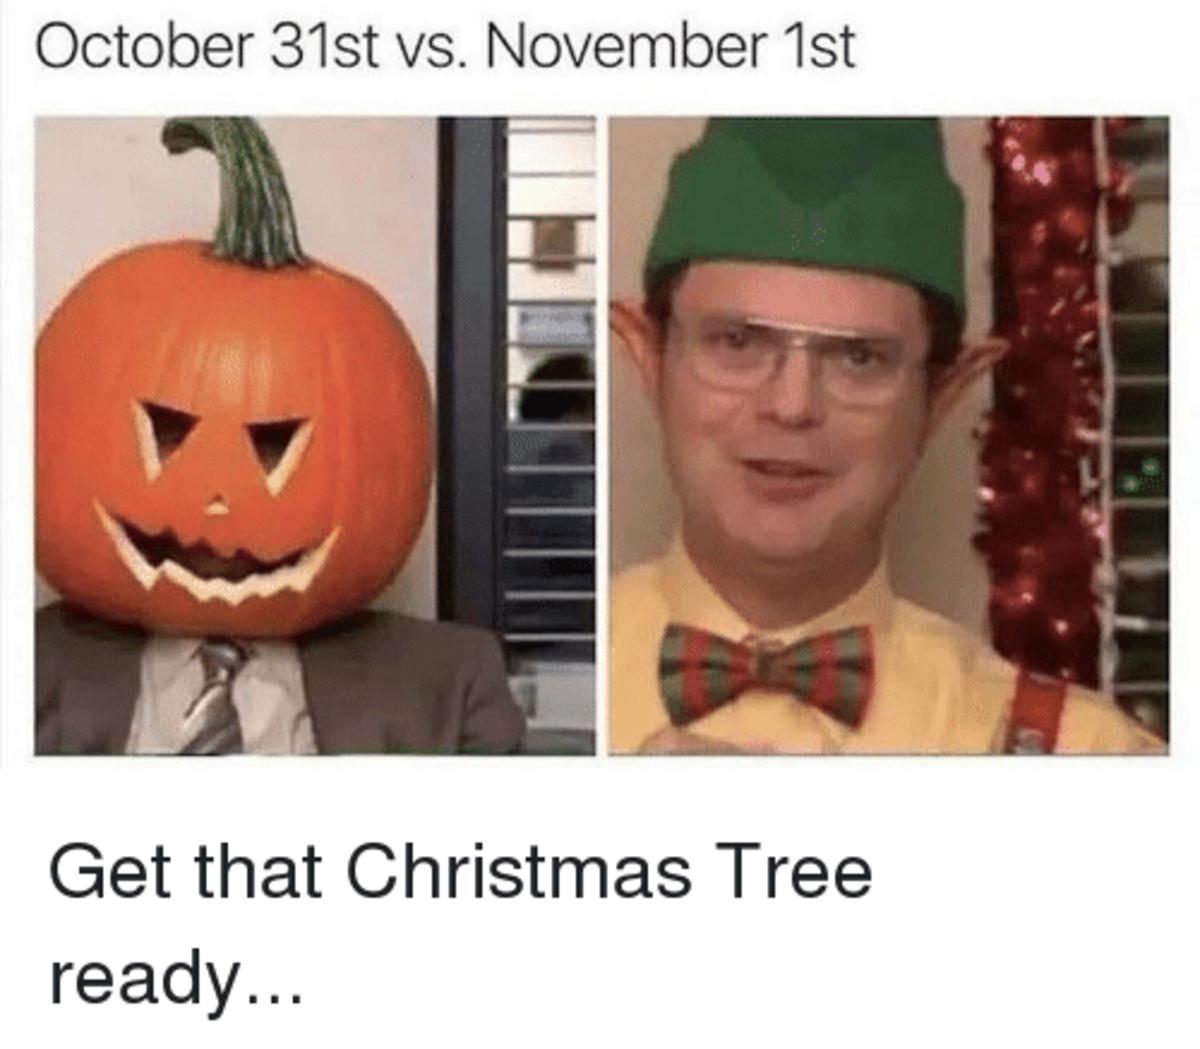 Christmas Halloween Thanksgiving Meme.10 Christmas Memes For The Holiday Season Hubpages